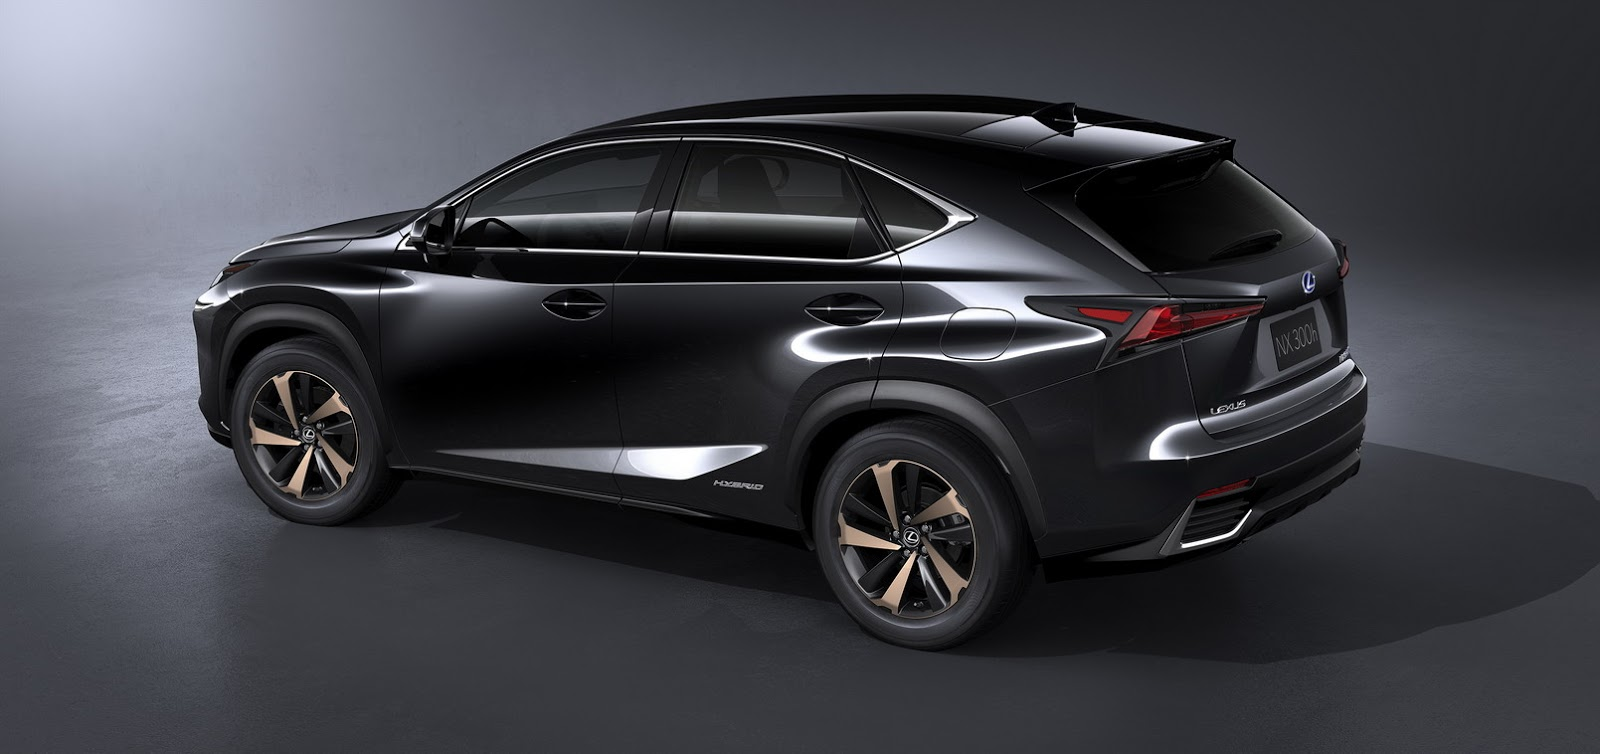 2018 Lexus Nx Facelift